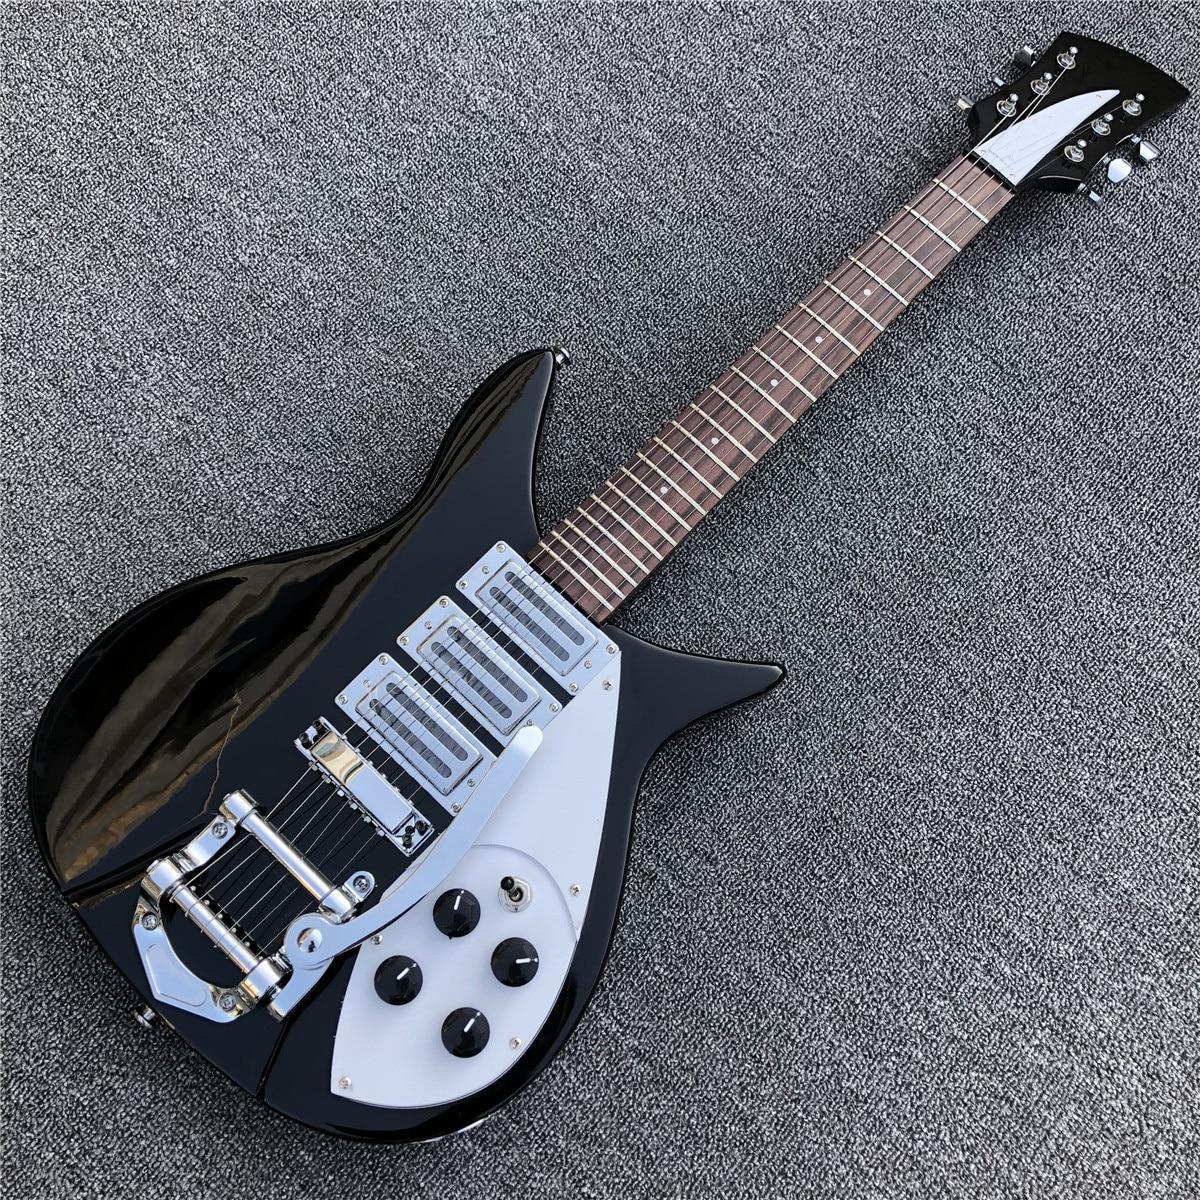 Hot Selling Black color Ricken 325 Electric Guitar Short Soild wood Body Guitarra In Stock